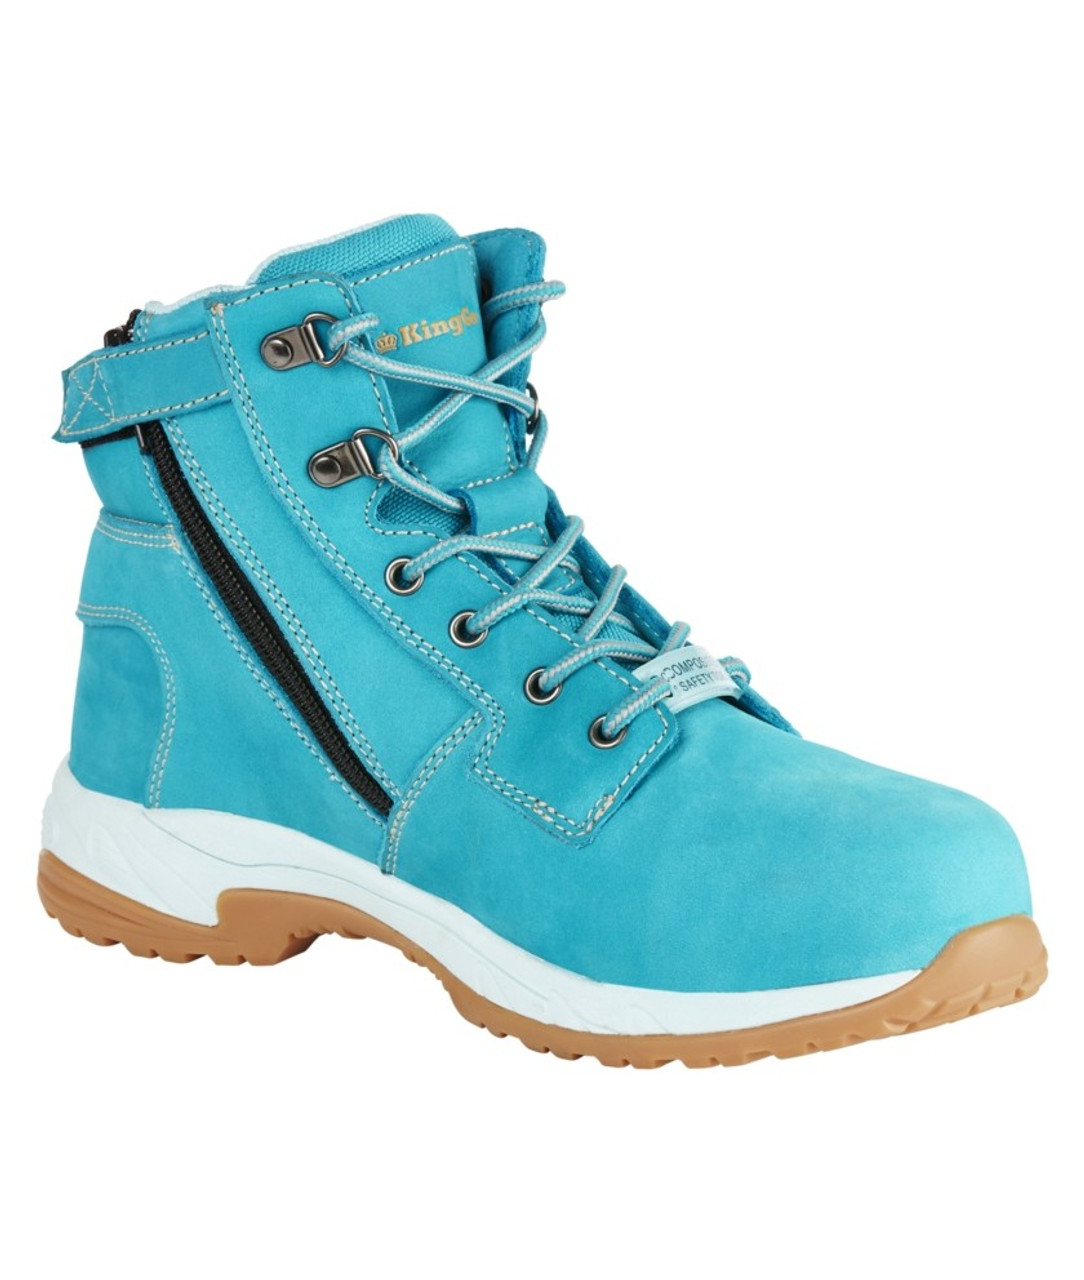 c2ae4b69cba KingGee Women's Tradie Zip Safety Work Boots in Teal Full Grain ...